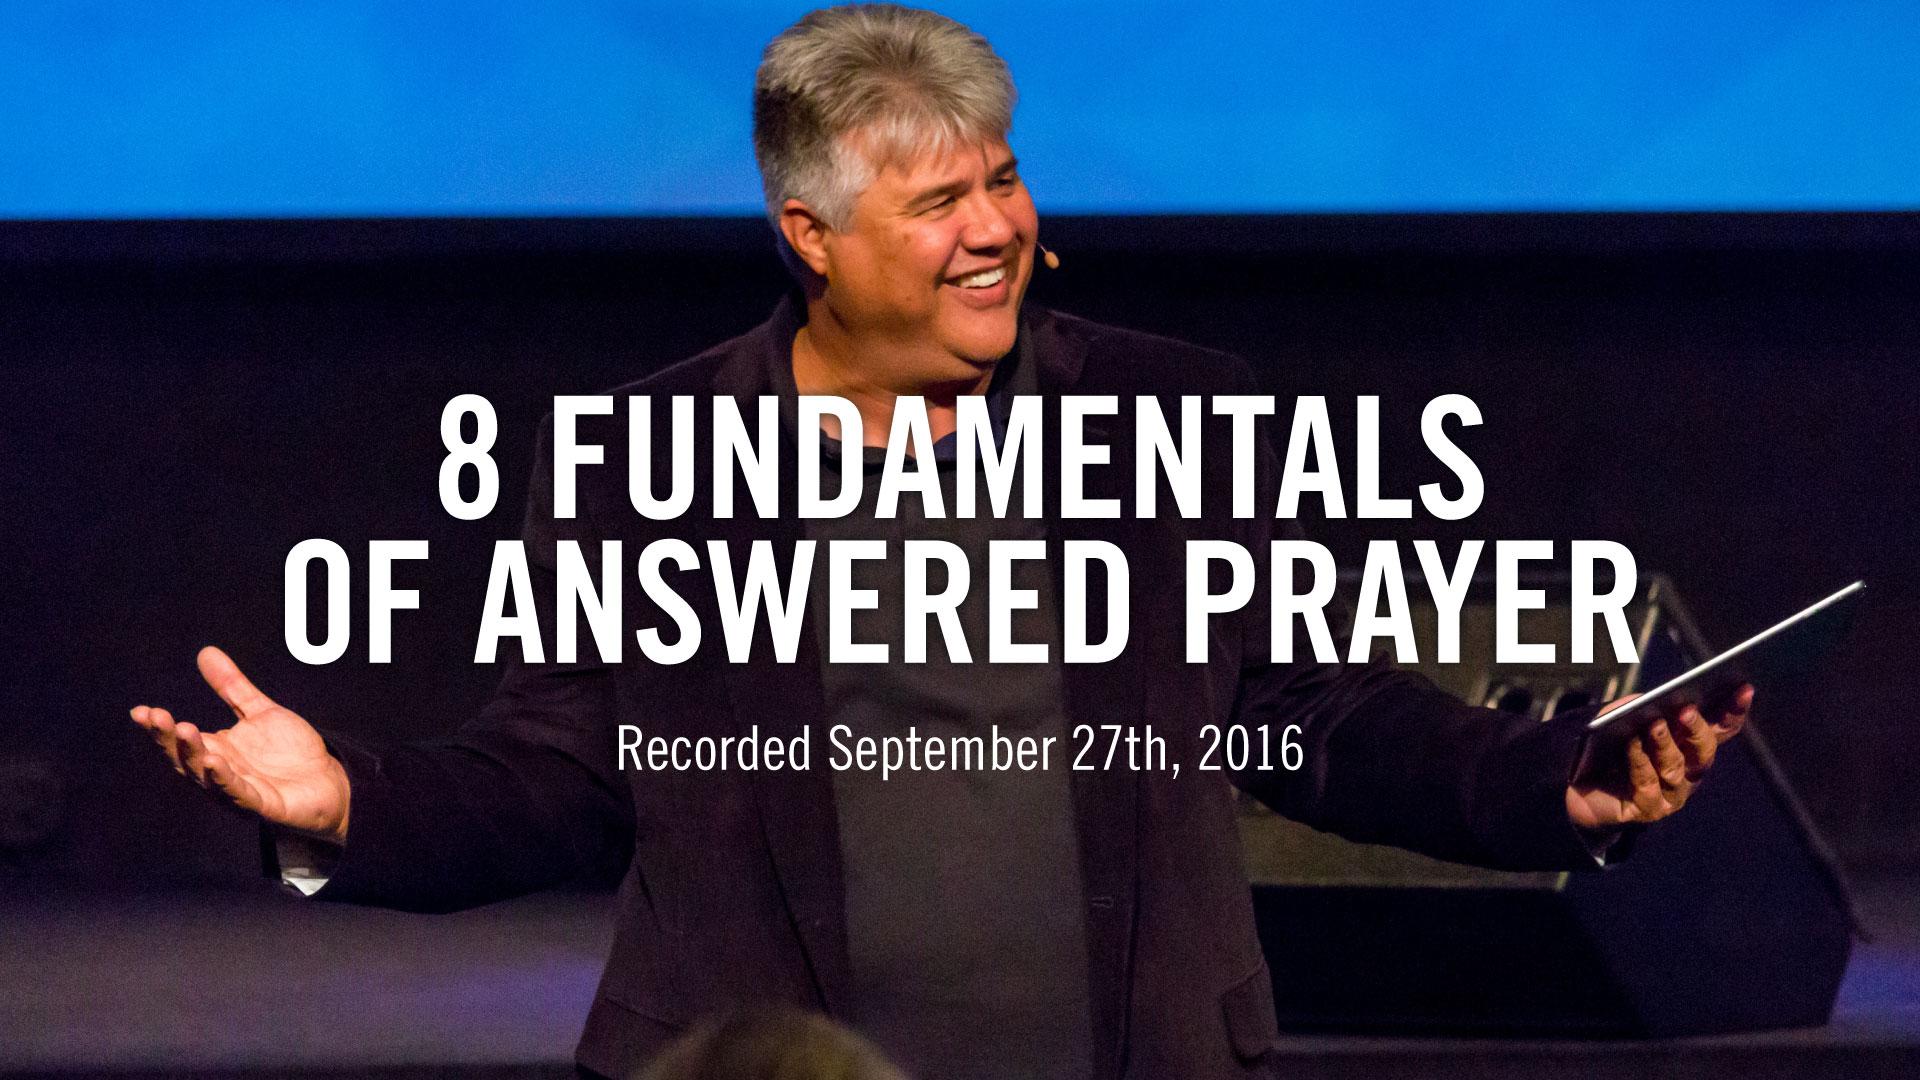 8-fundamentals-of-answered-prayer_part-1_week-of-prayer-2016_theme_pastor-steve-mccartt-family-worship-center-florence_web